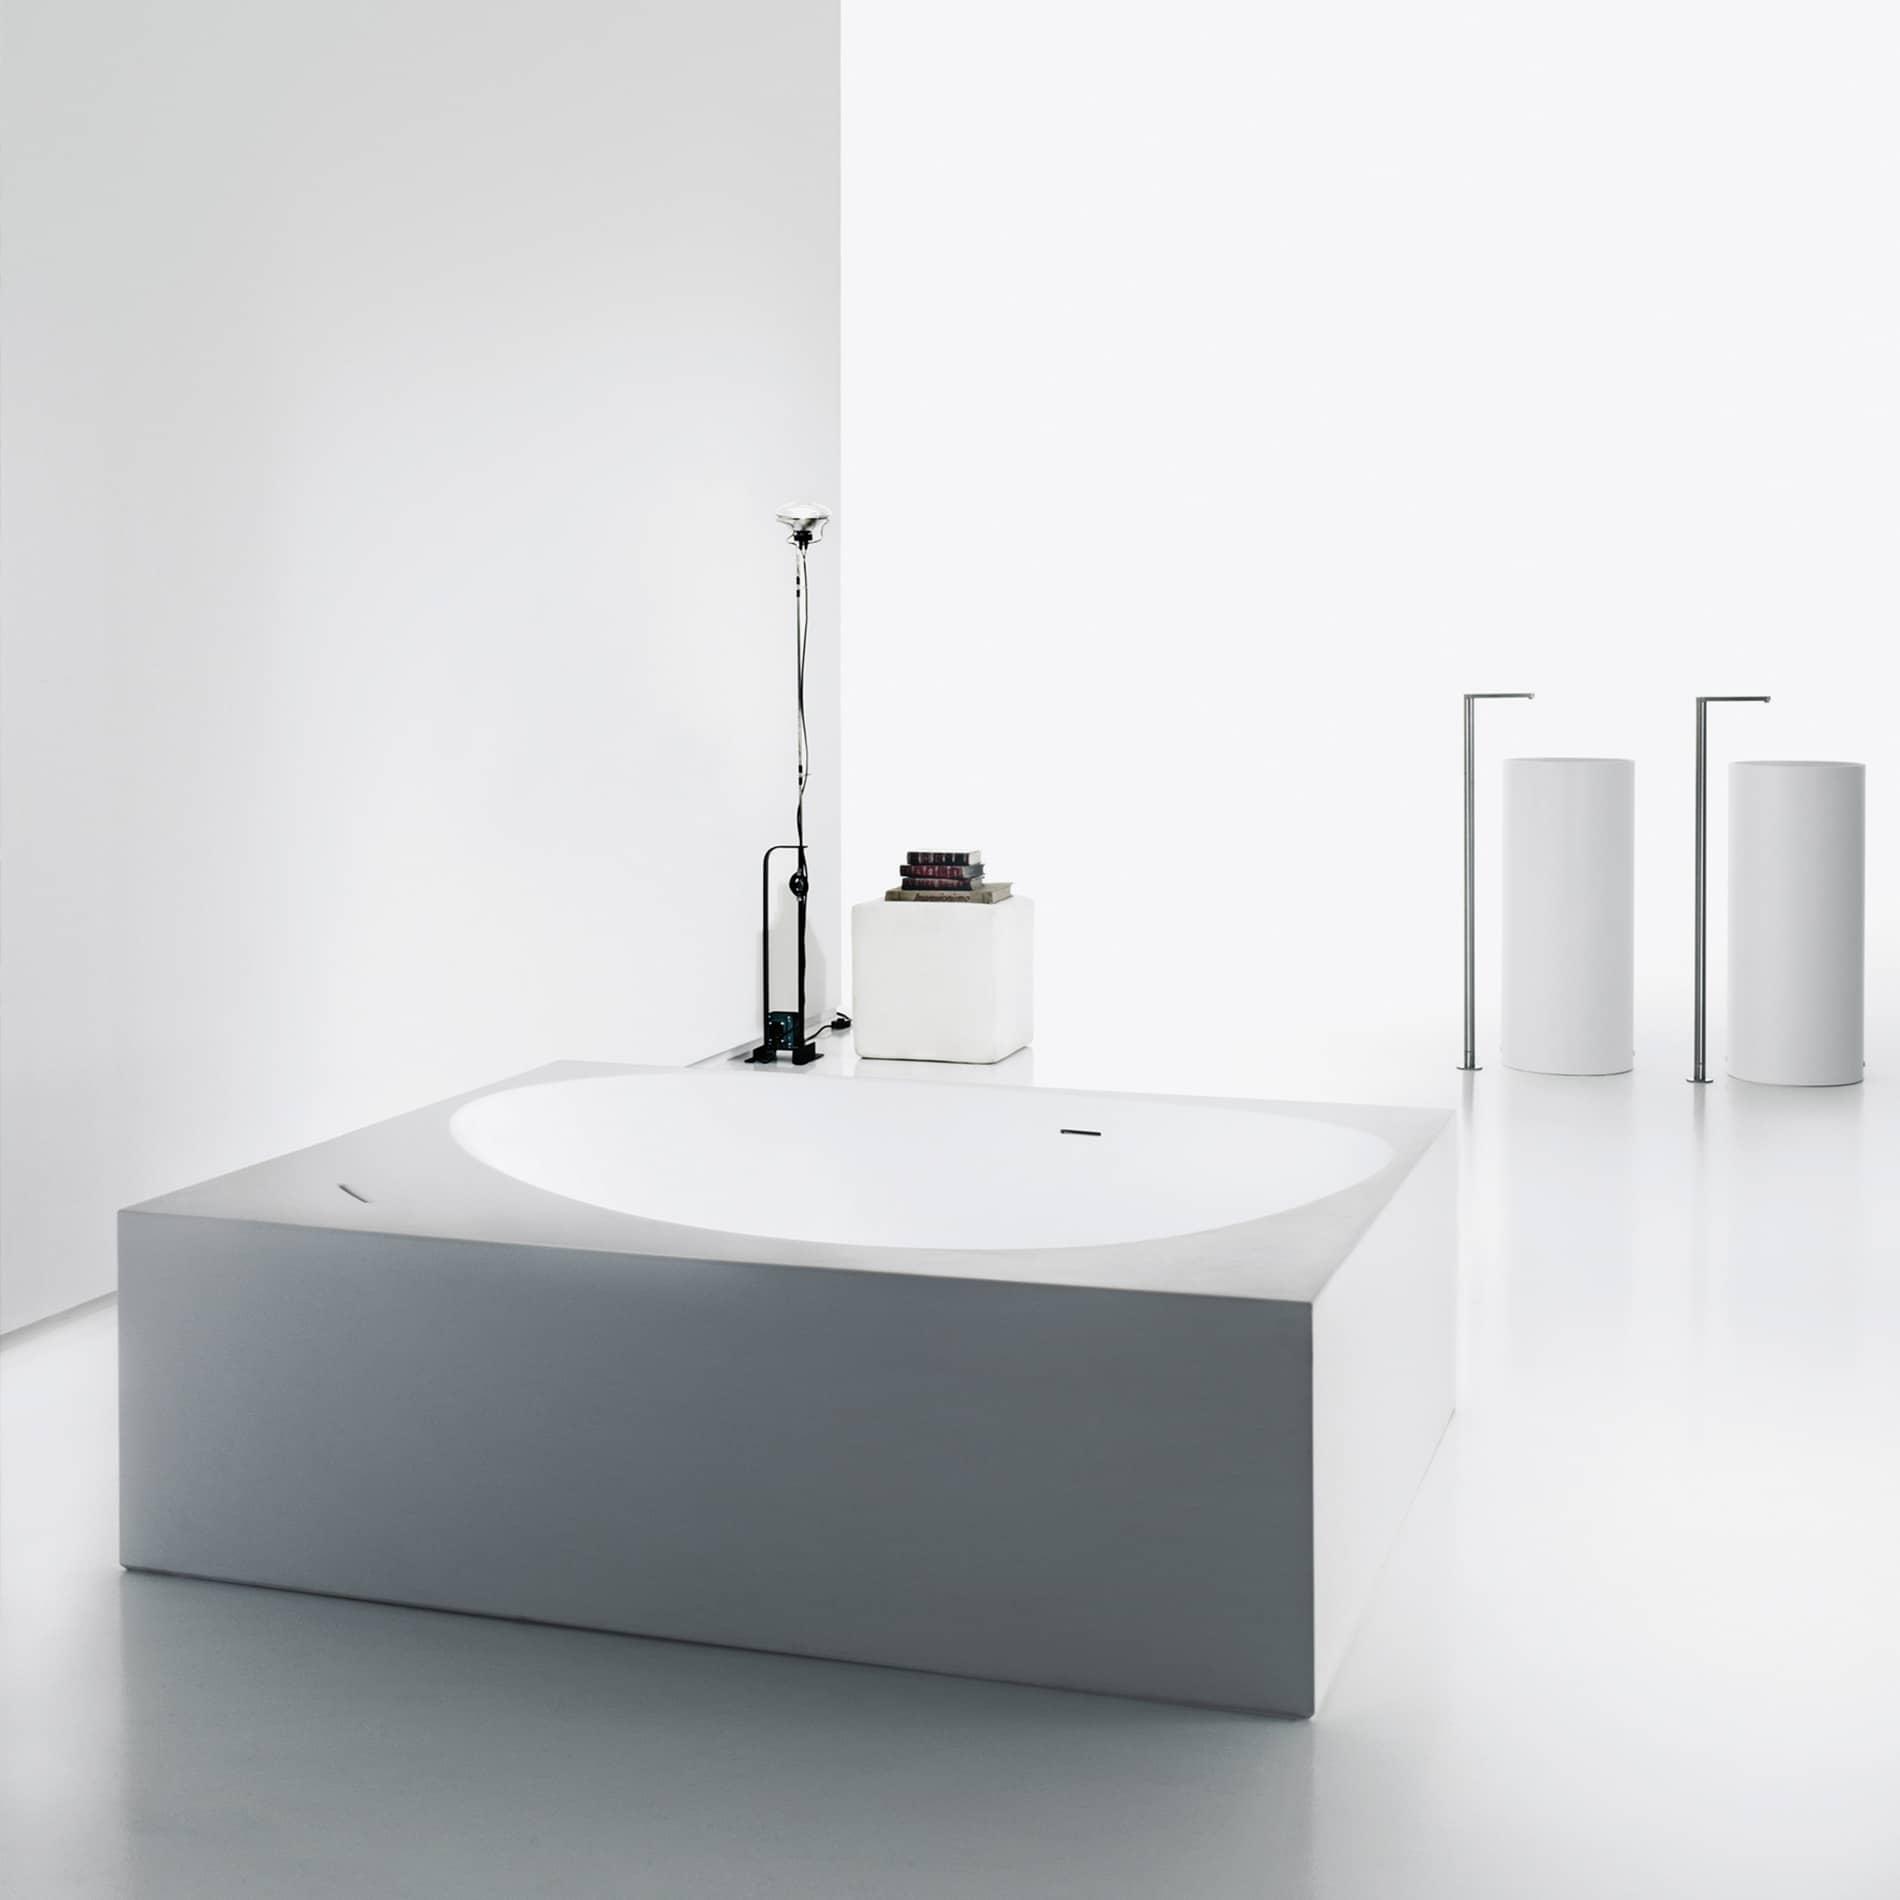 Cristalplant-products-Boffi-tub-1